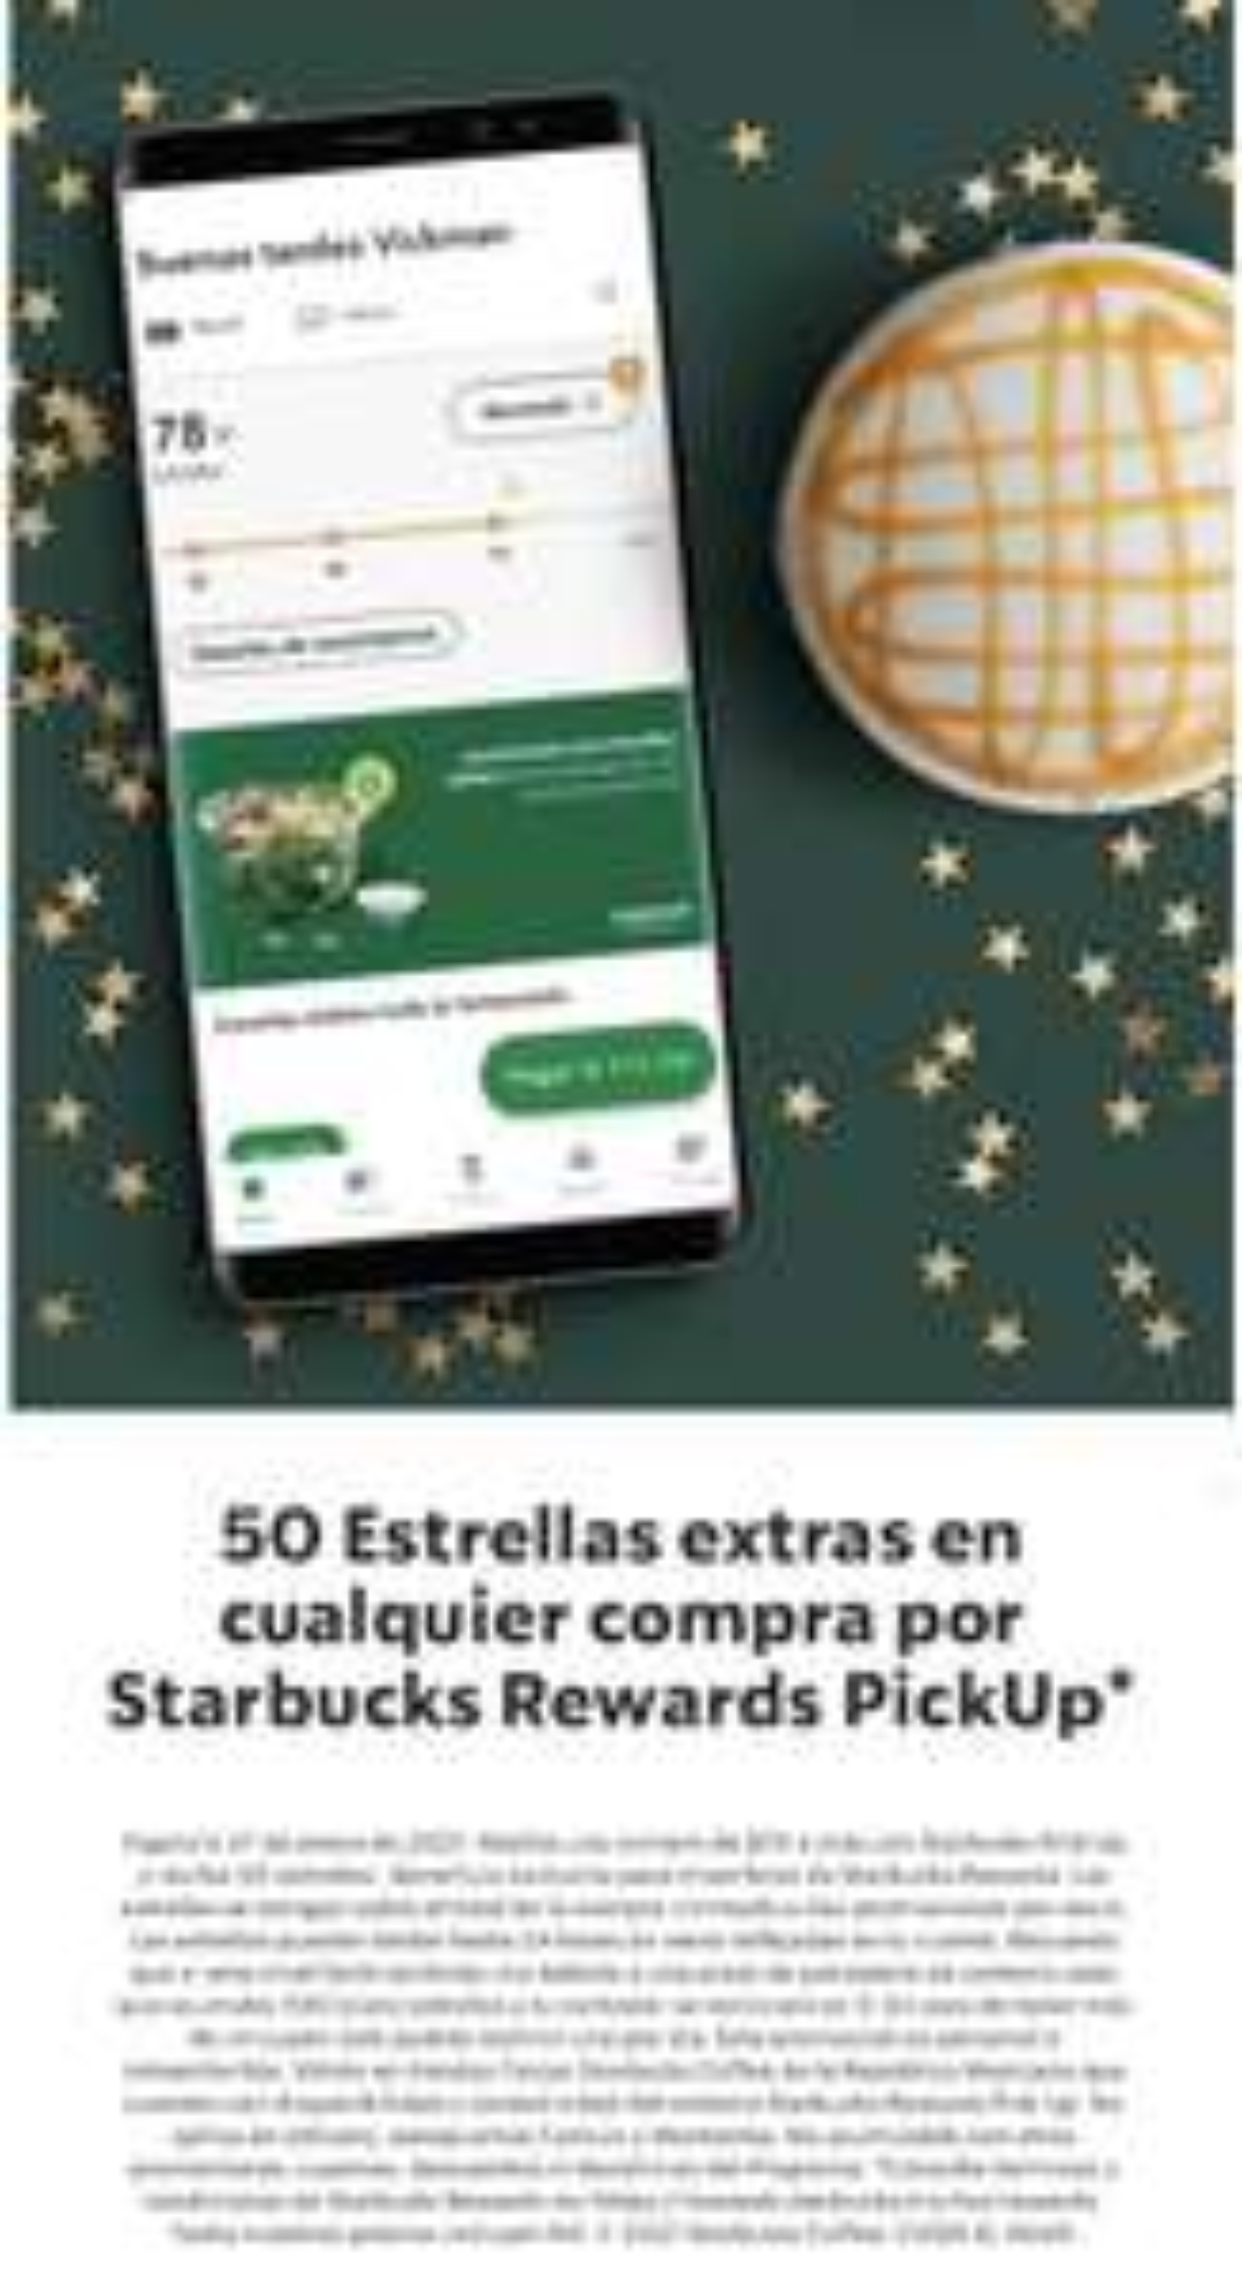 Starbucks: 50 Estrellas Extras